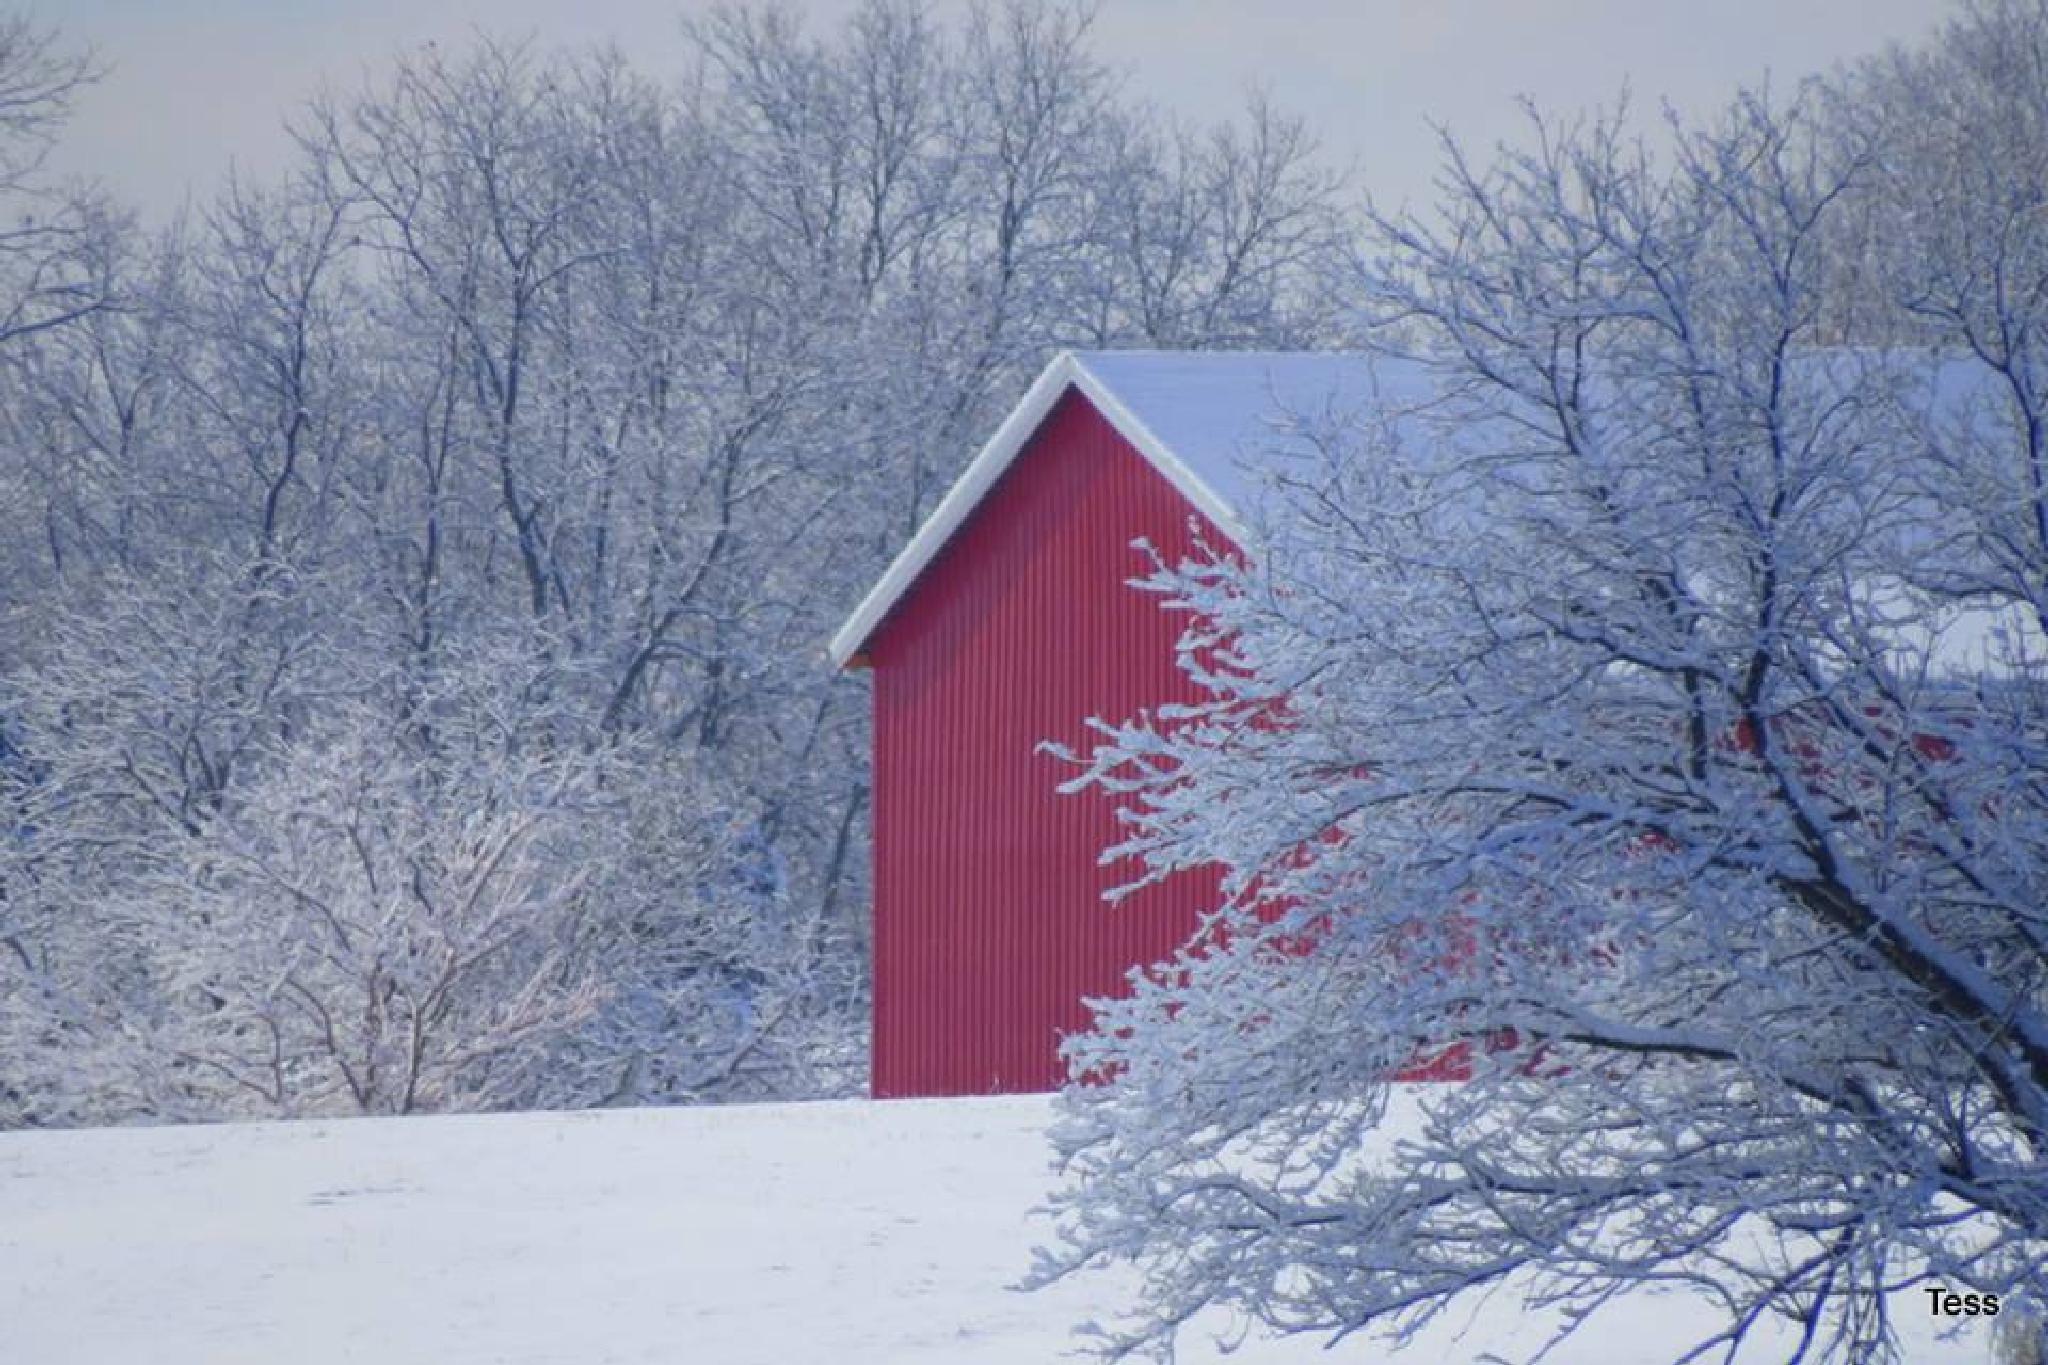 My Neighbors barn  by teresa.ehling